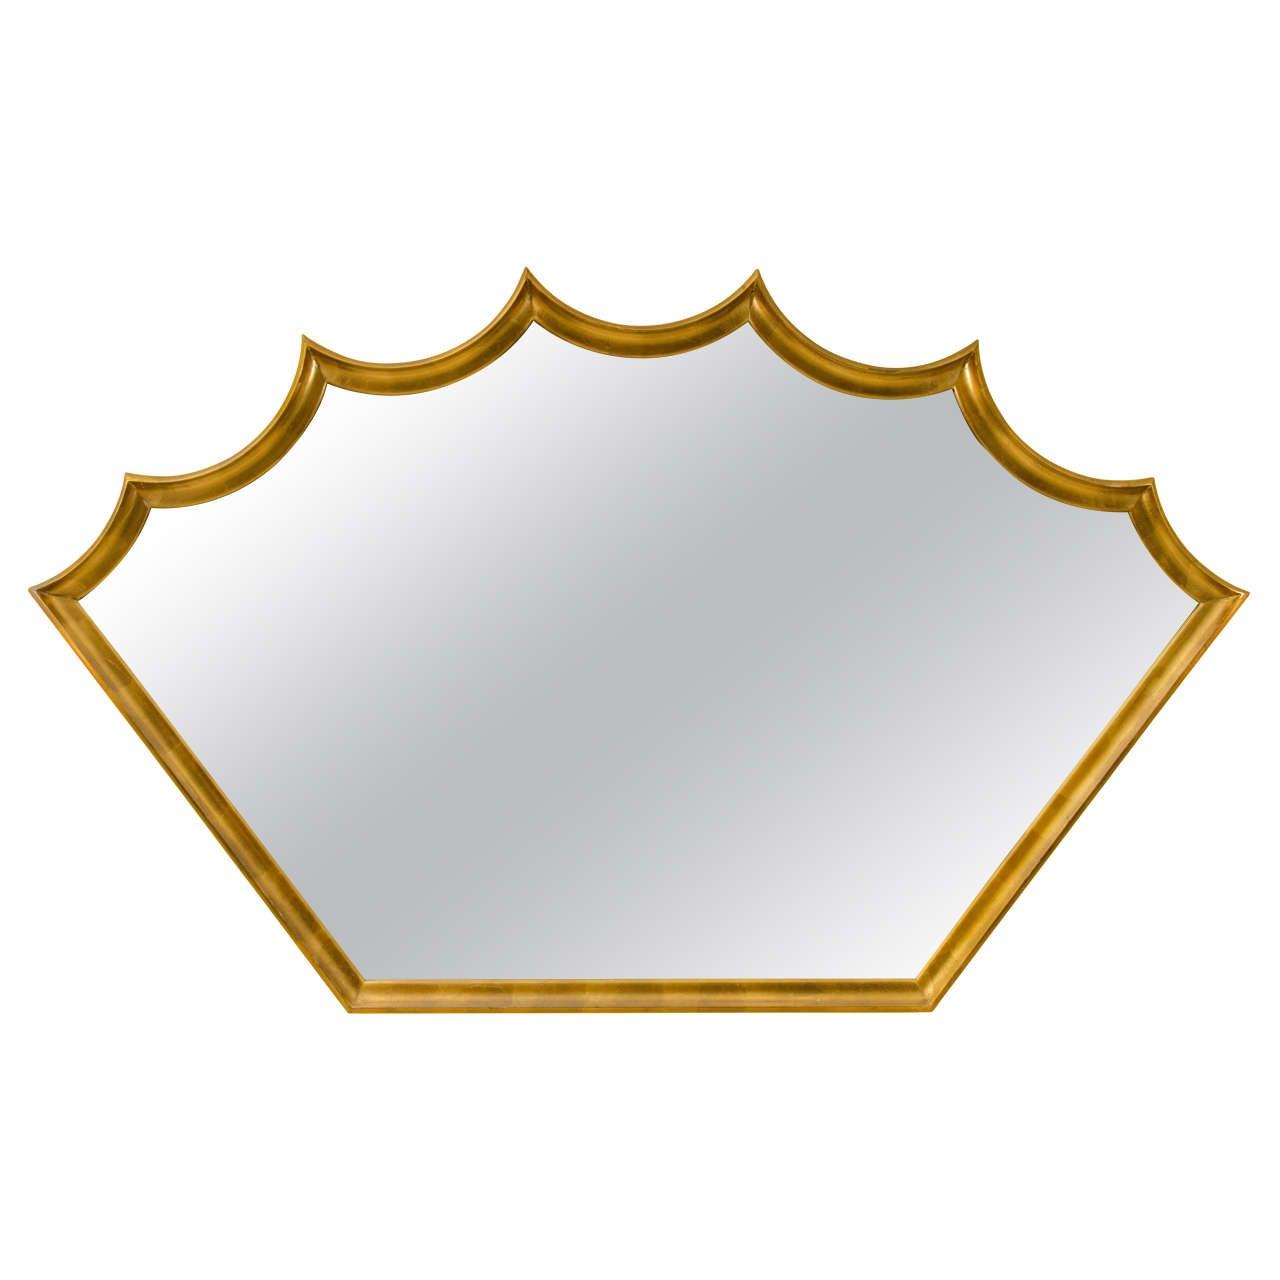 Decorative Modern Gold Leaf Mirror By La Barge At 1stdibs